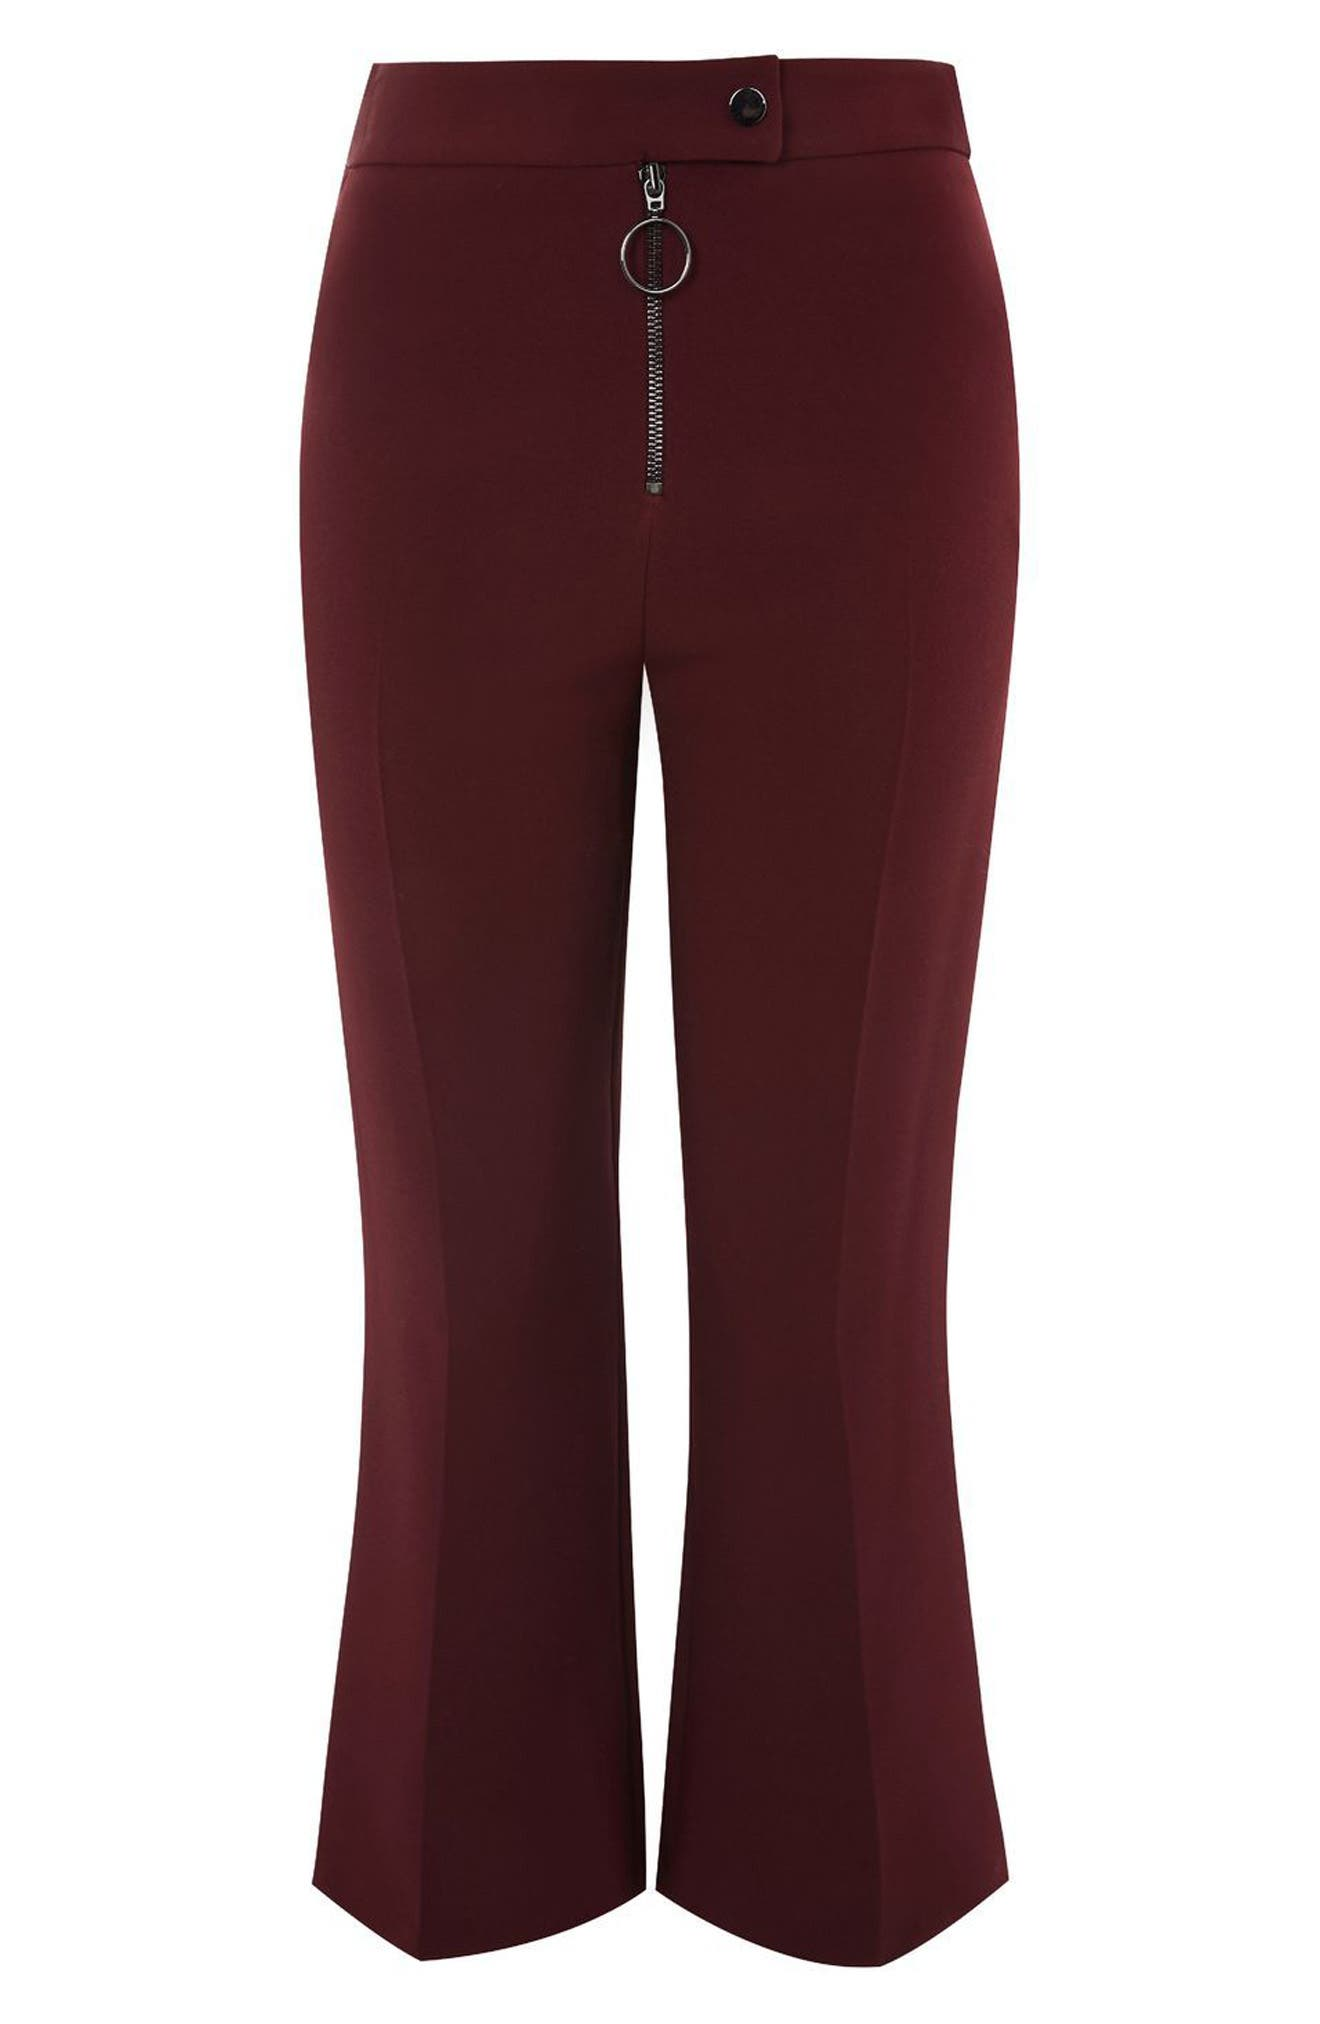 Alternate Image 1 Selected - Topshop Exposed Zip Kick Flare Pants